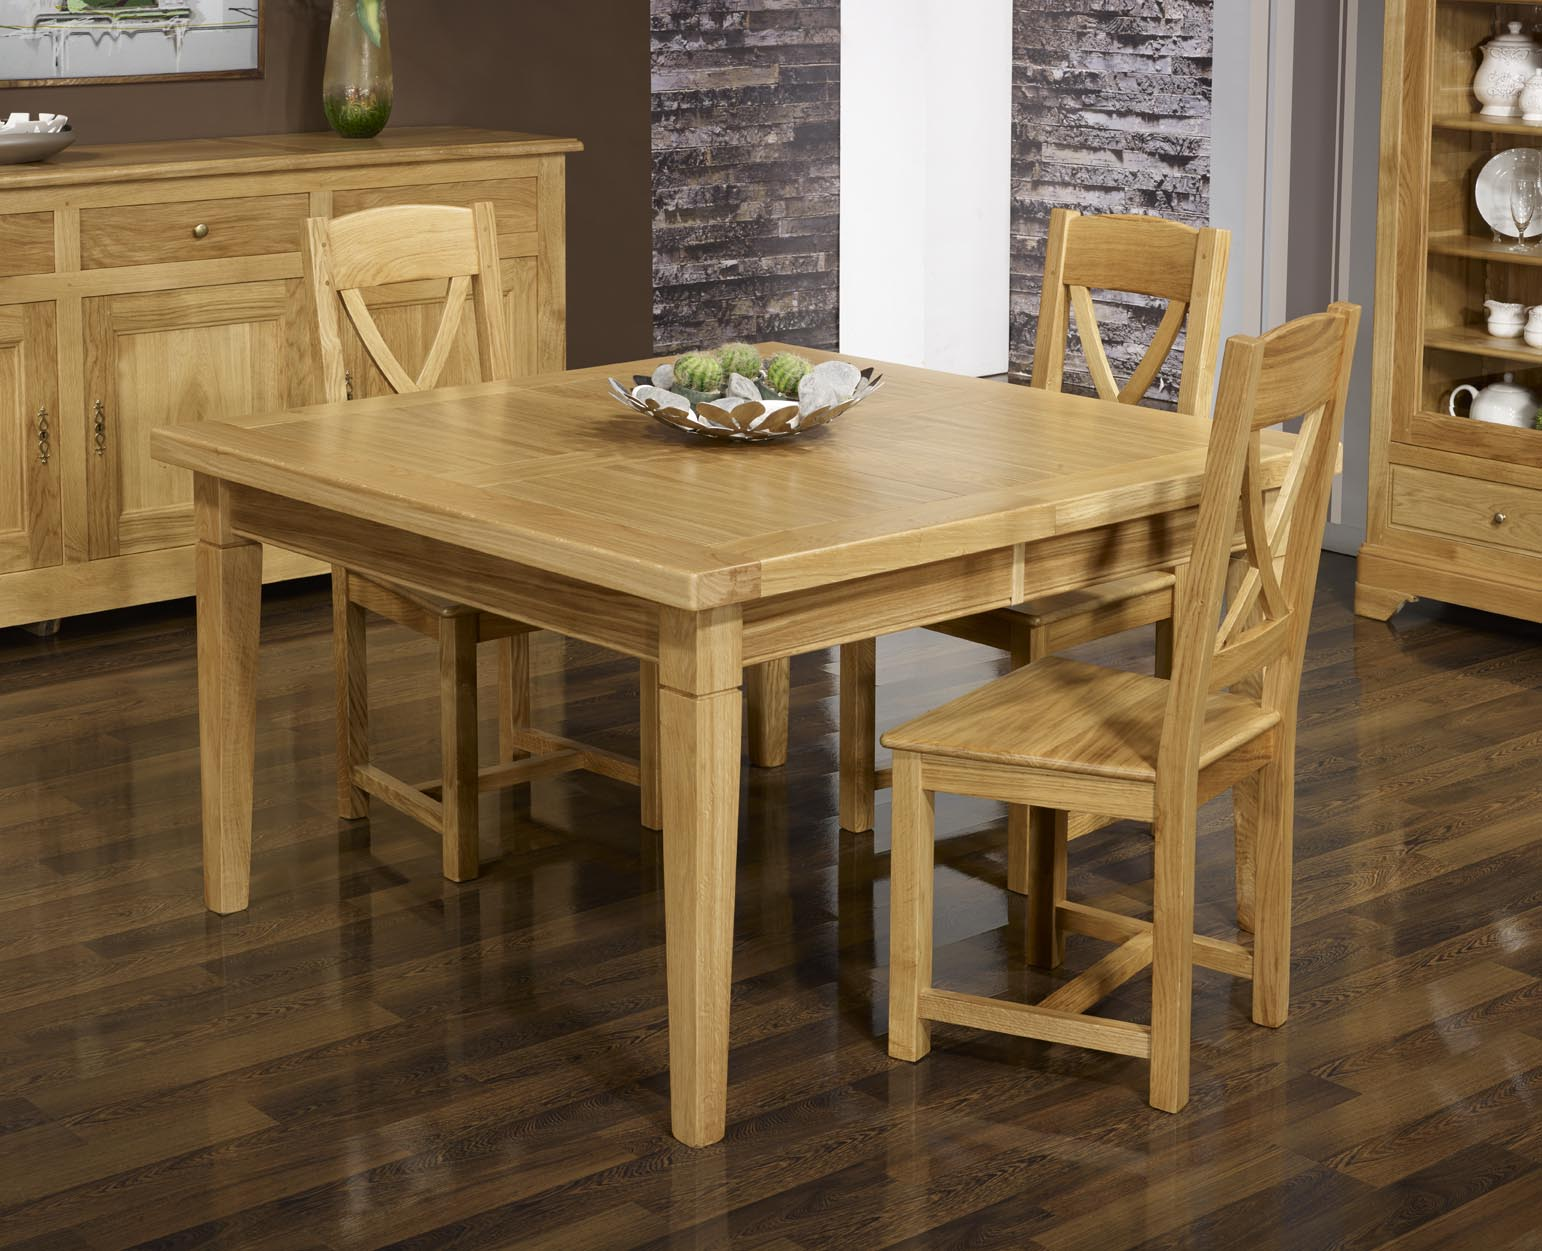 Mesa de comedor cuadrada de madera de roble macizo 150x150 for Mesa comedor roble macizo